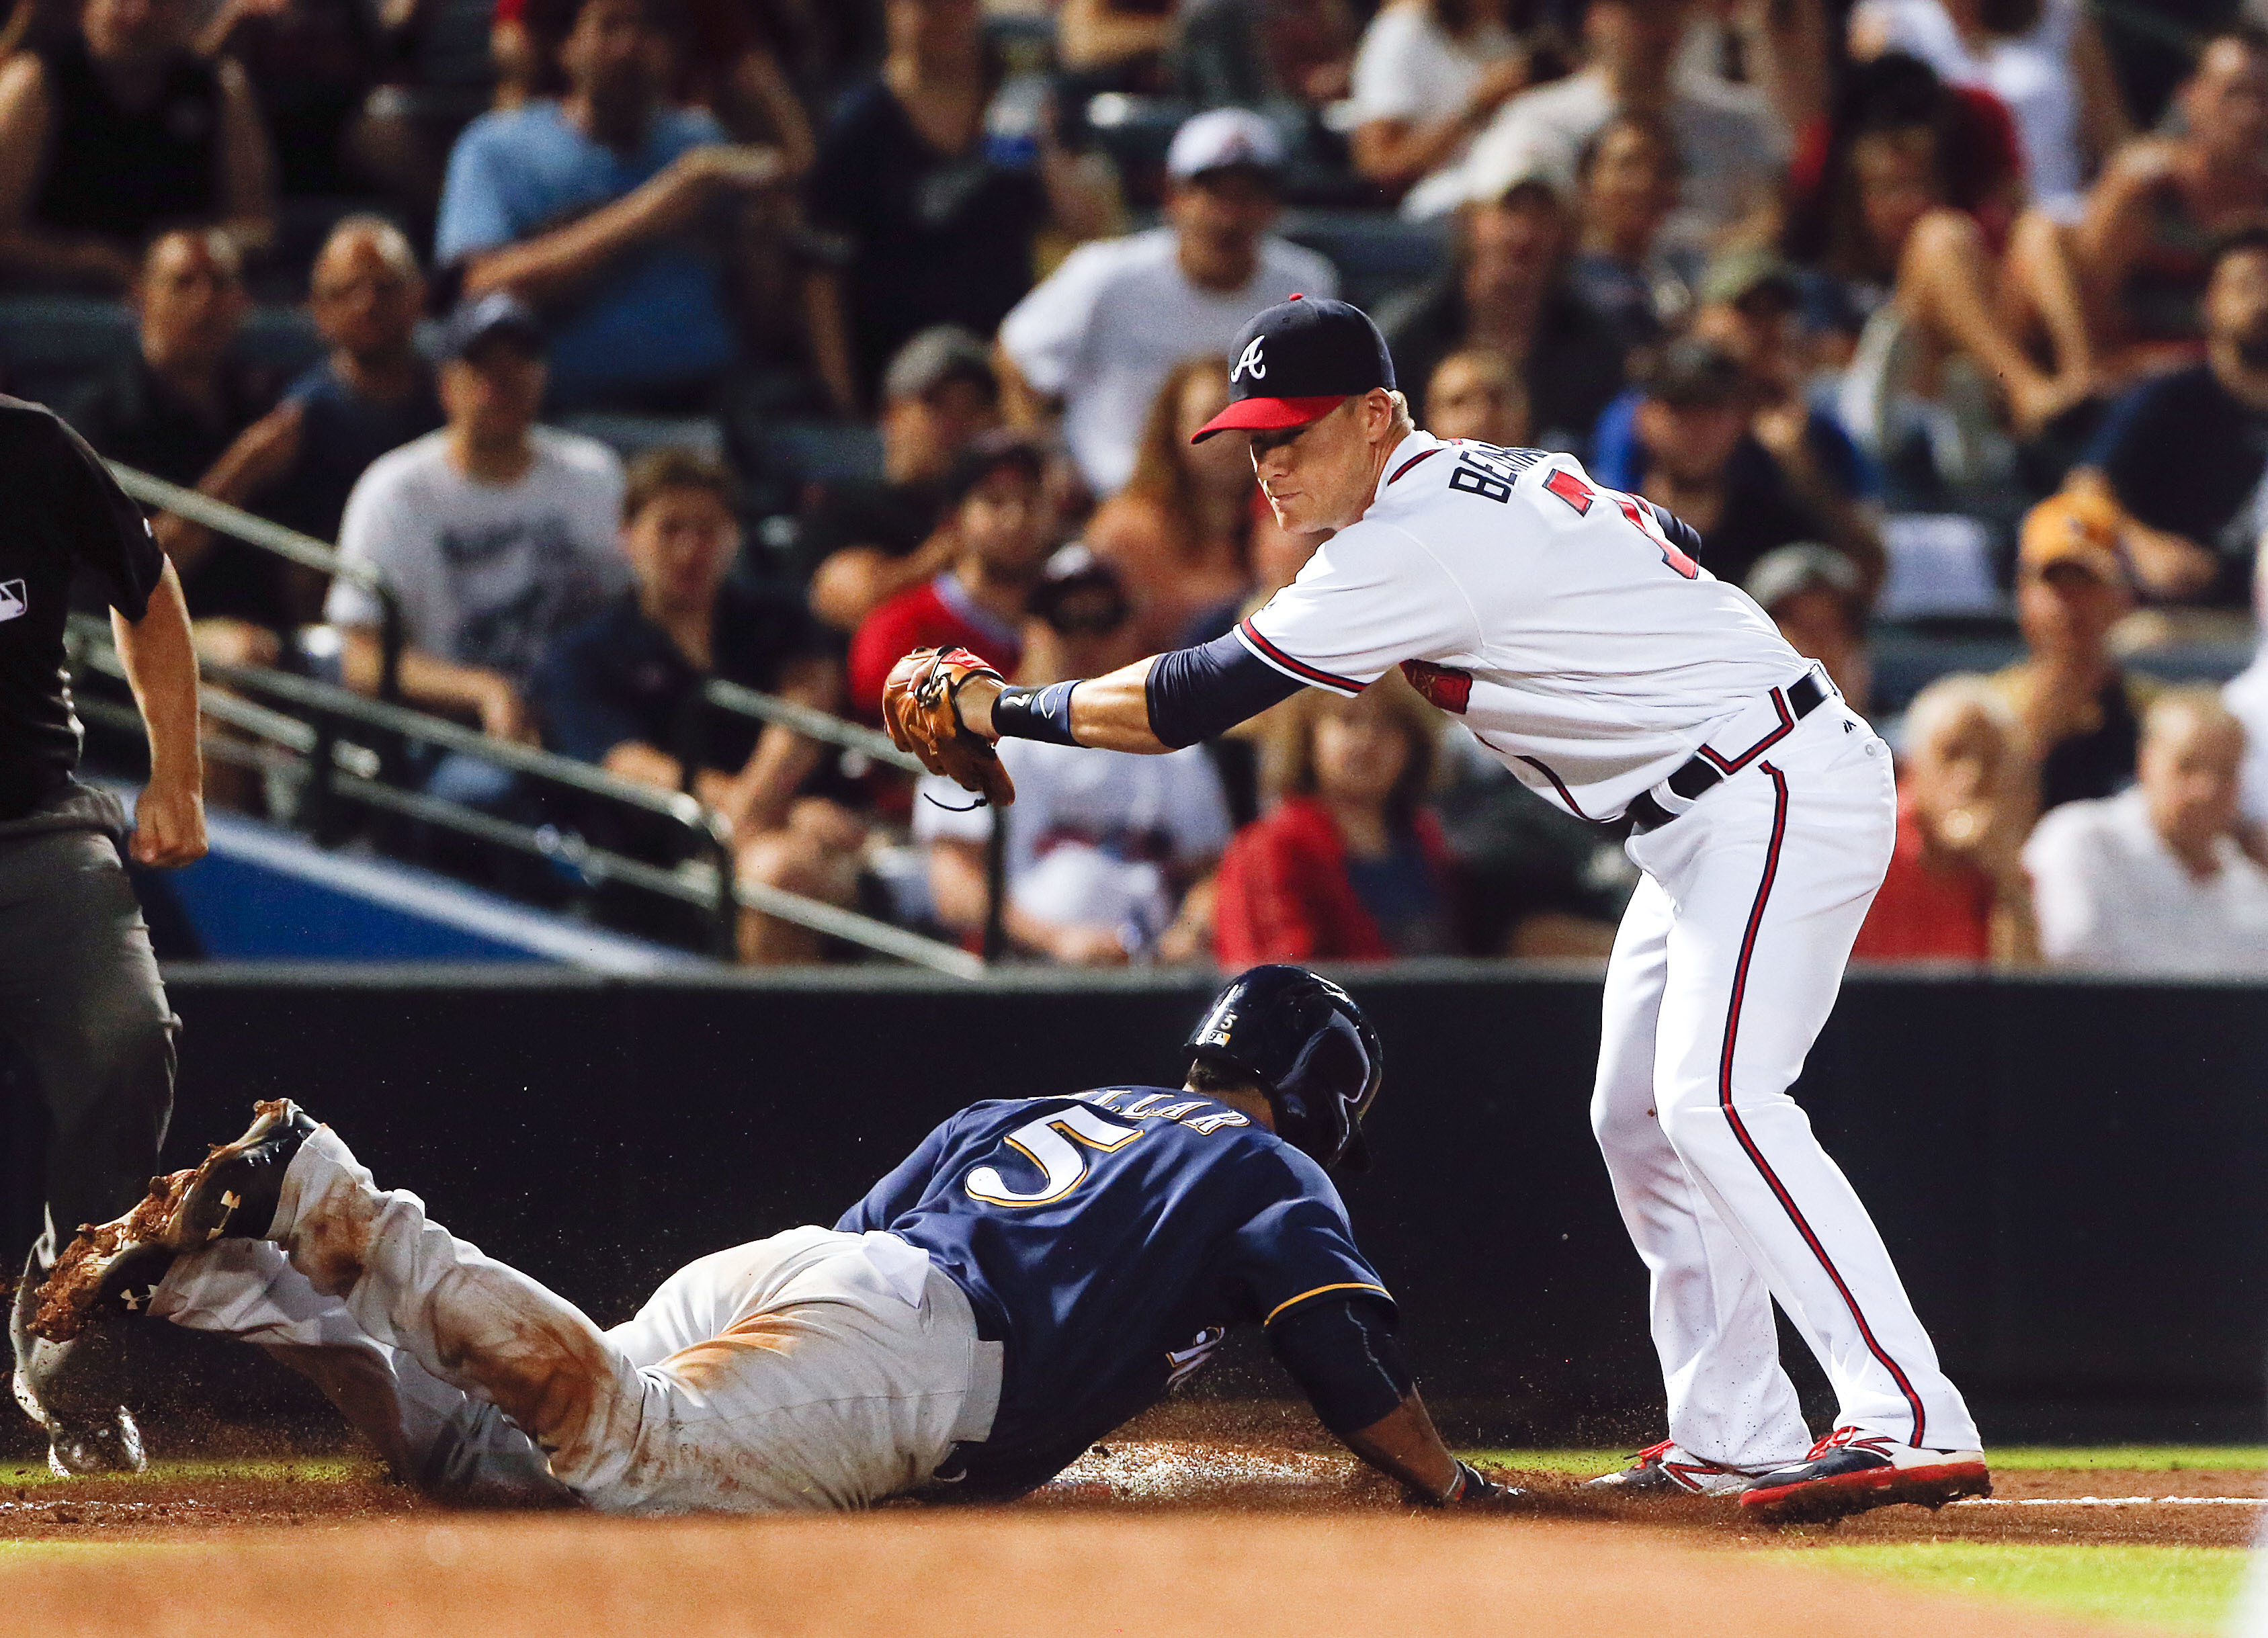 Milwaukee Brewers' Jonathan Villar (5) is tagged out at third by Atlanta Braves third baseman Gordon Beckham (7) on a Ryan Braun ground ball in the sixth inning of baseball game Tuesday, May 24, 2016, in Atlanta. (AP Photo/John Bazemore)